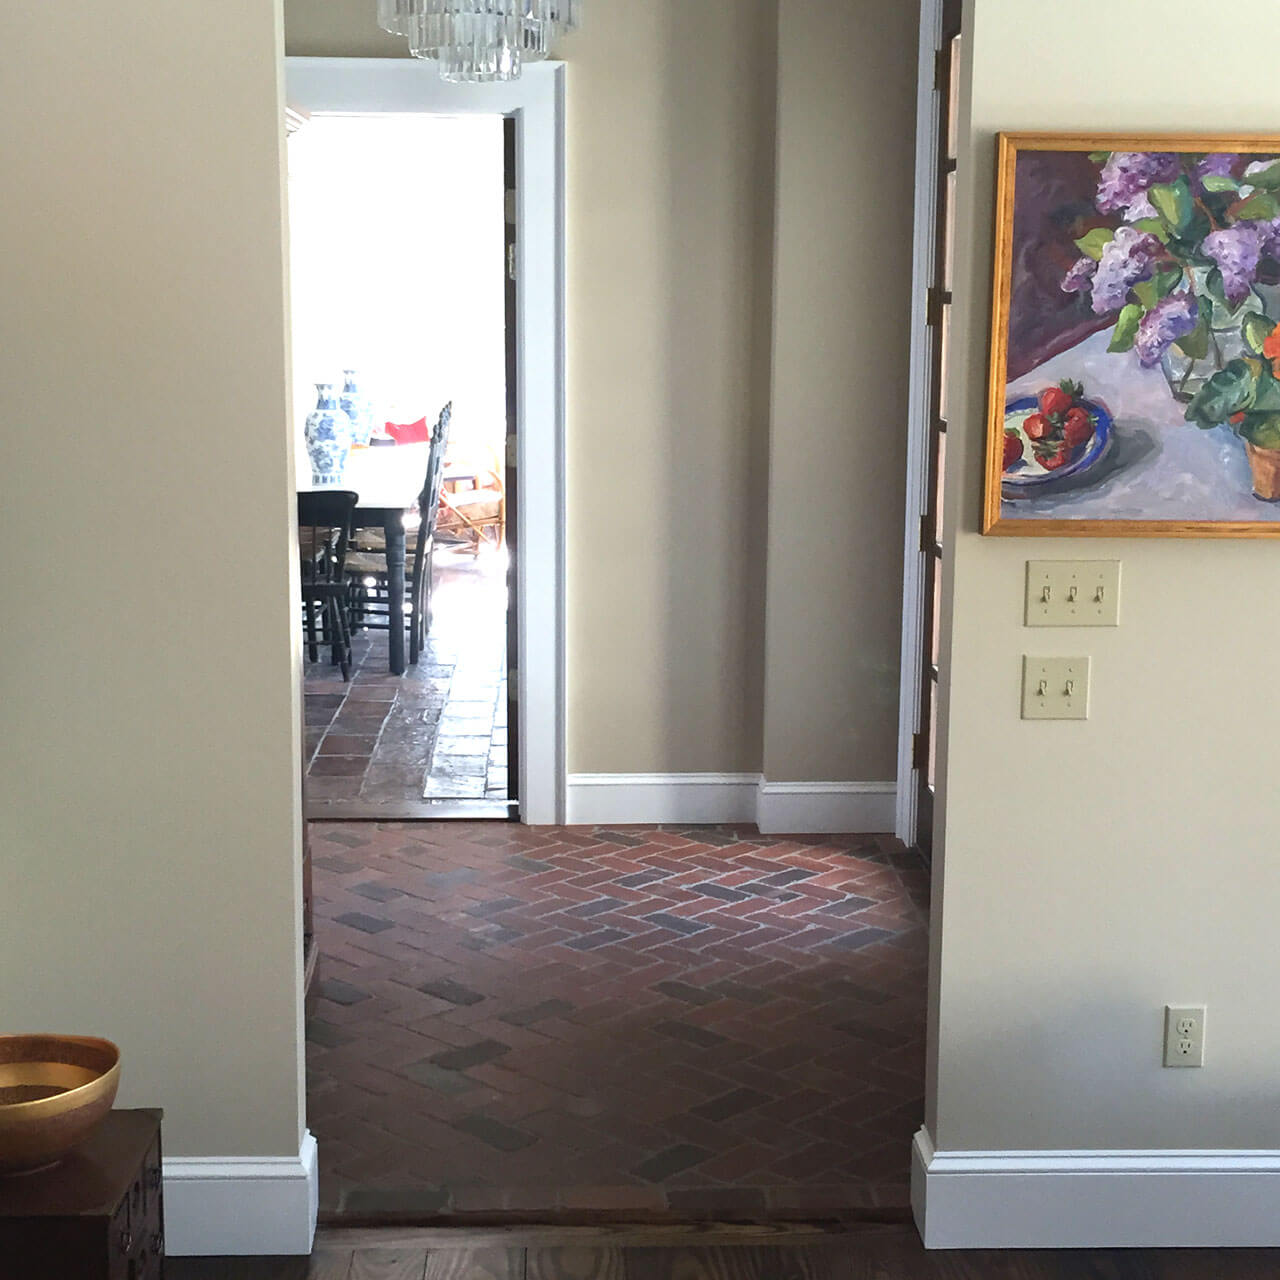 Tumbled thin brick floor